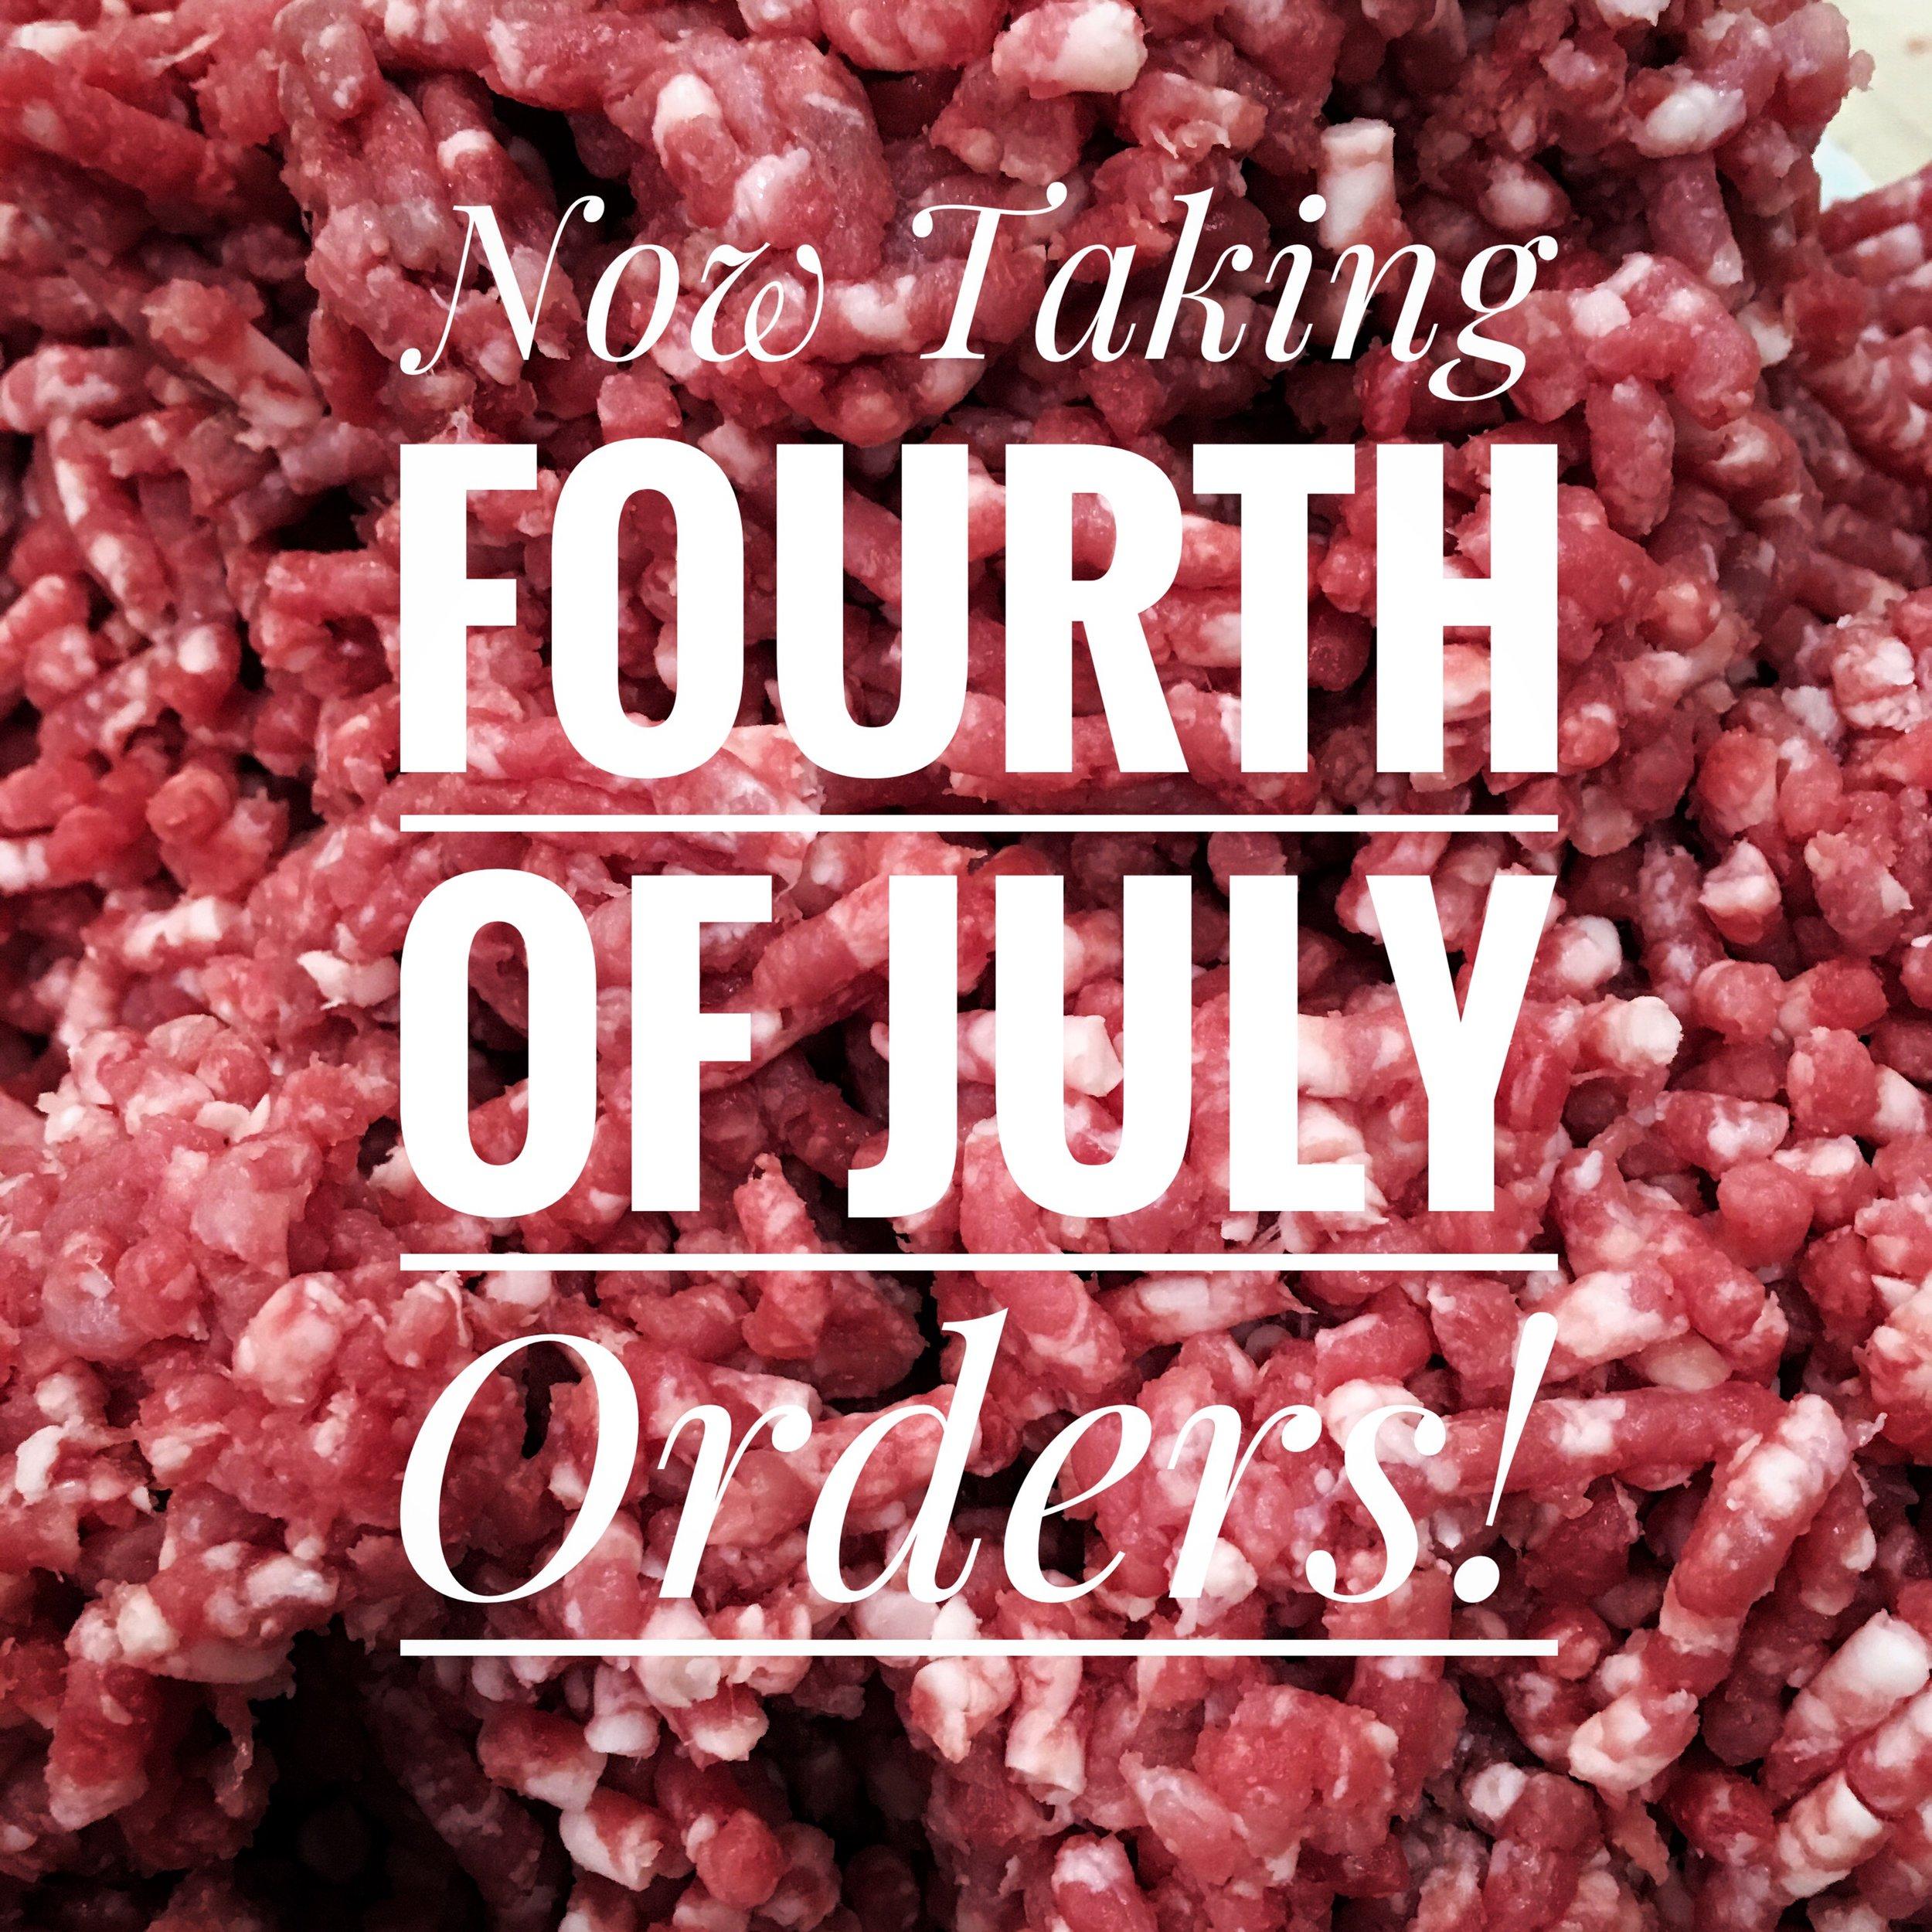 Fourth orders.jpg